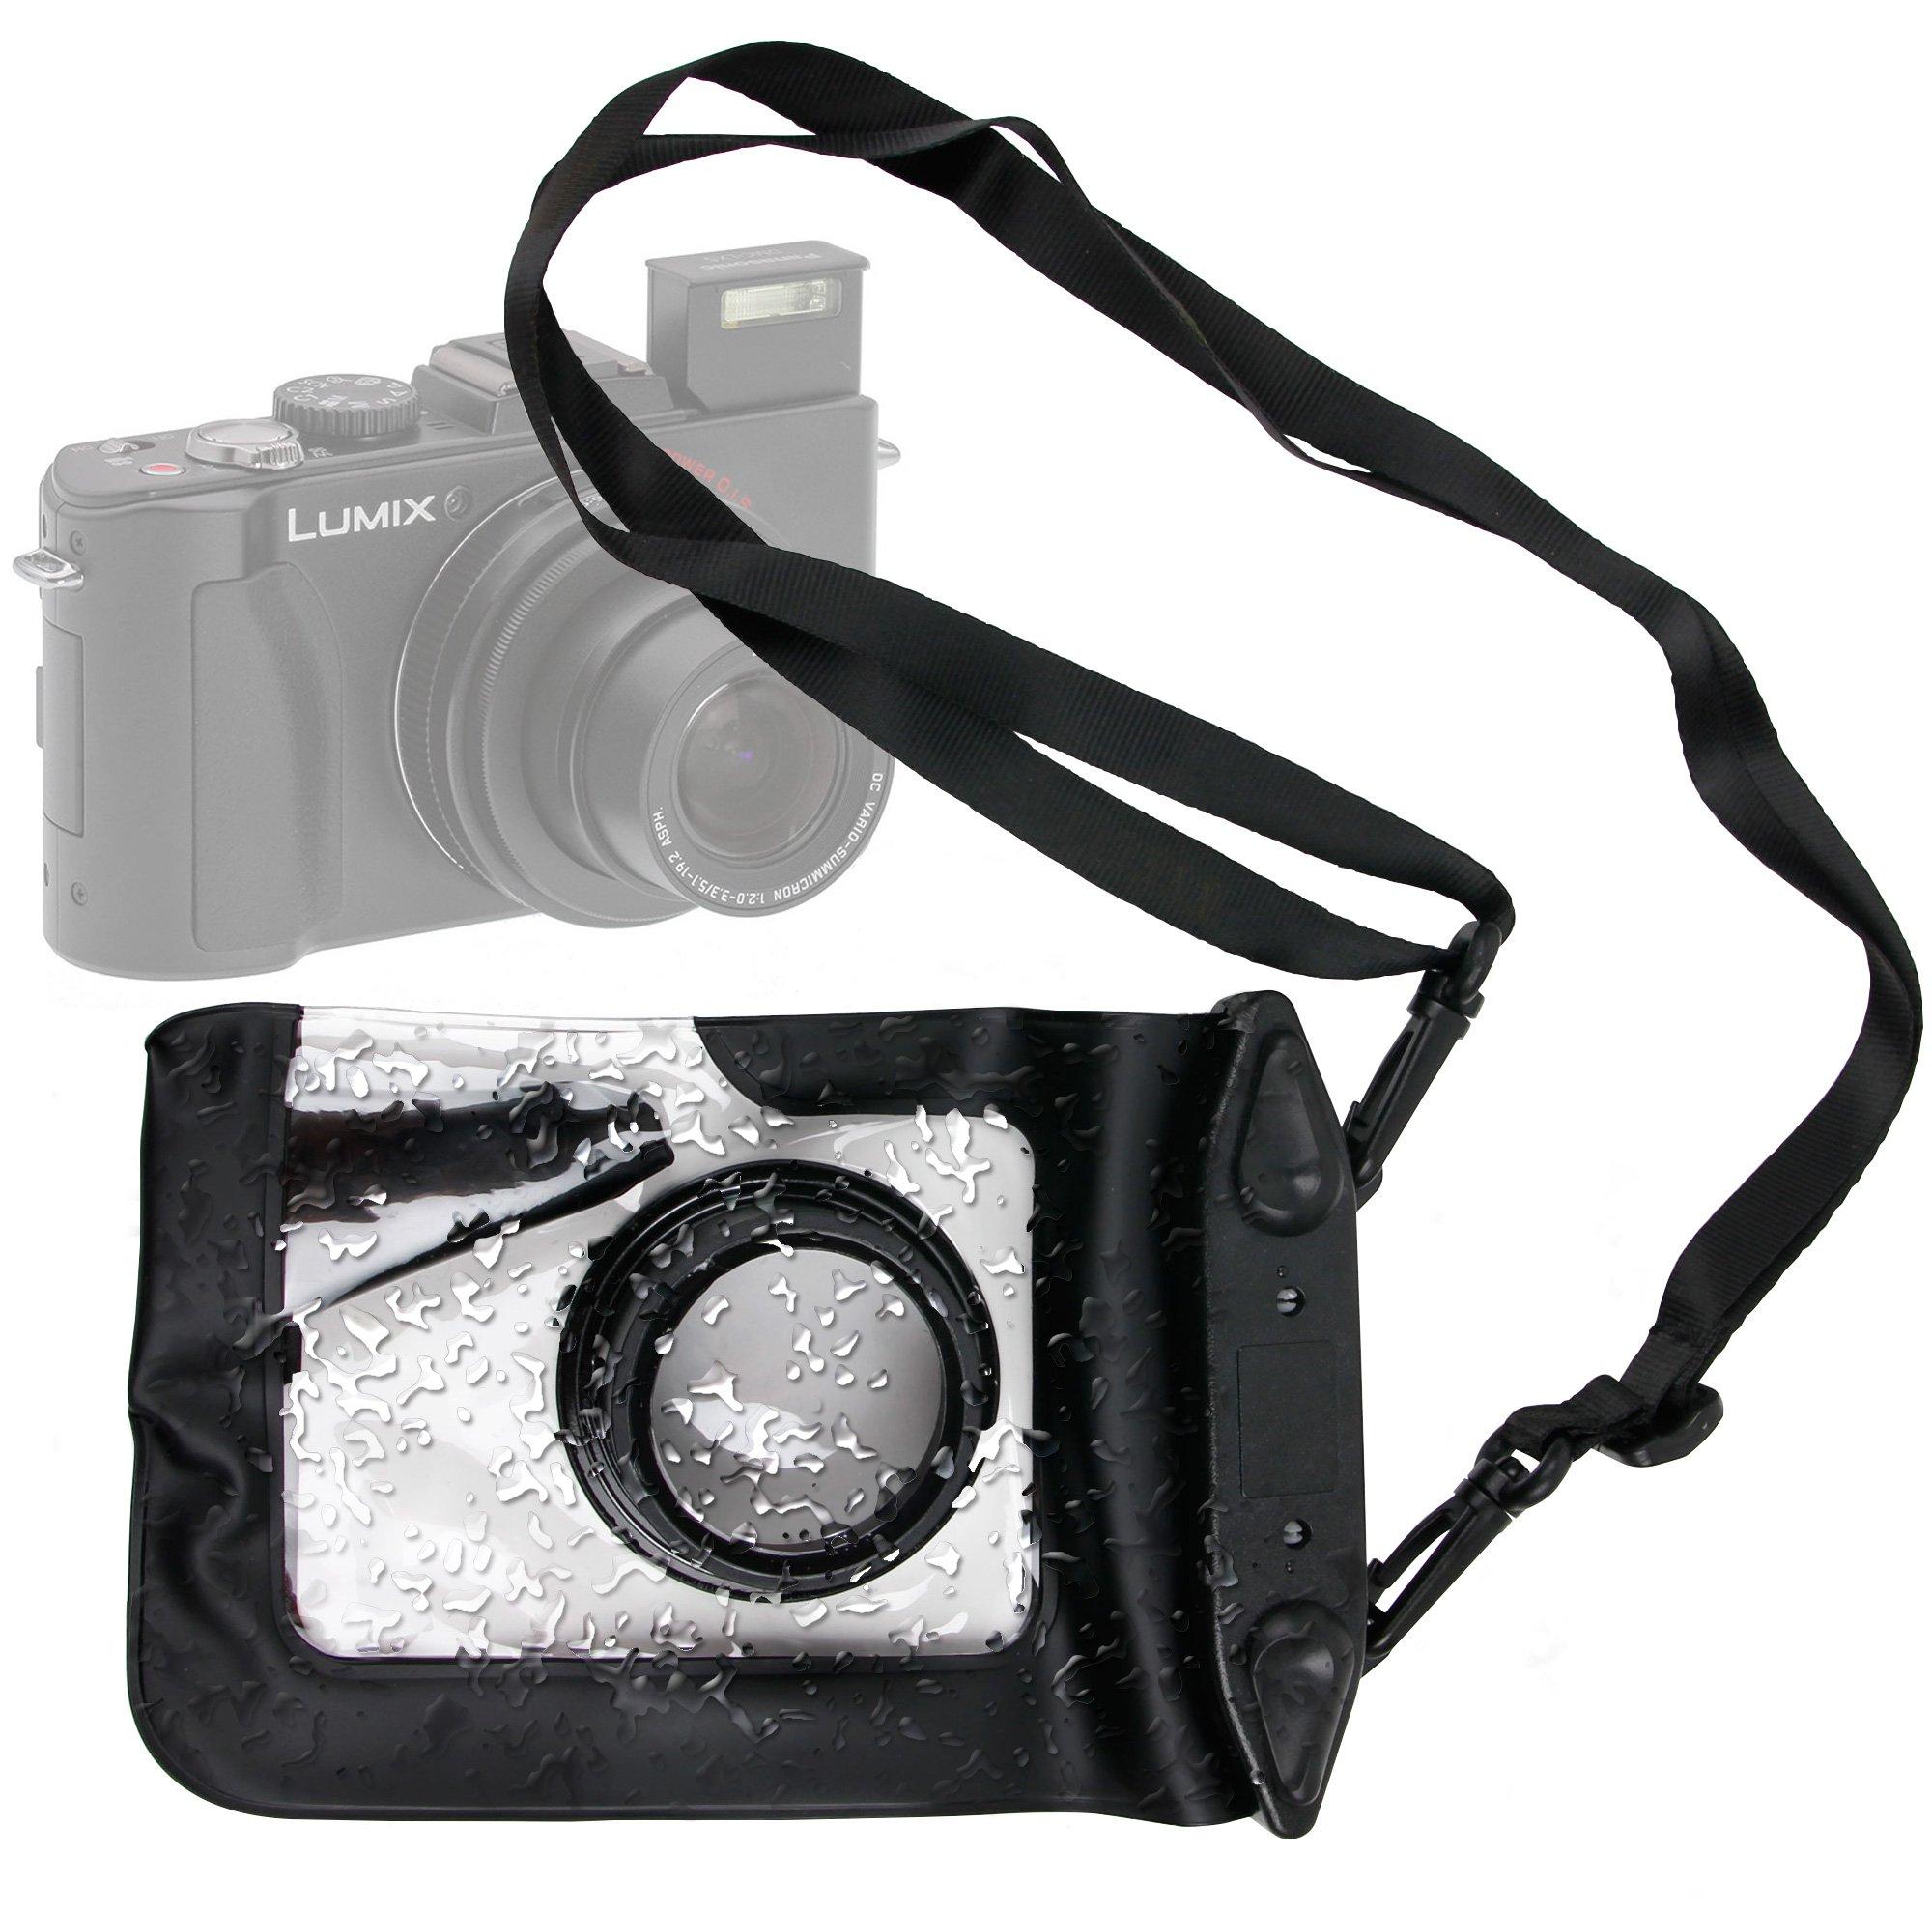 DURAGADGET Compact Camera Case in Black for Panasonic Lumix LX5, FT20, TZ30, DMC-XS1, DMC-F5, DMC-FH10, DMC-TS25 & DMC-Z9 - Premium Quality, Water-Resistant Pouch with Zoom Lens Compartment, Cross-Body Strap & Air-Locked Seals